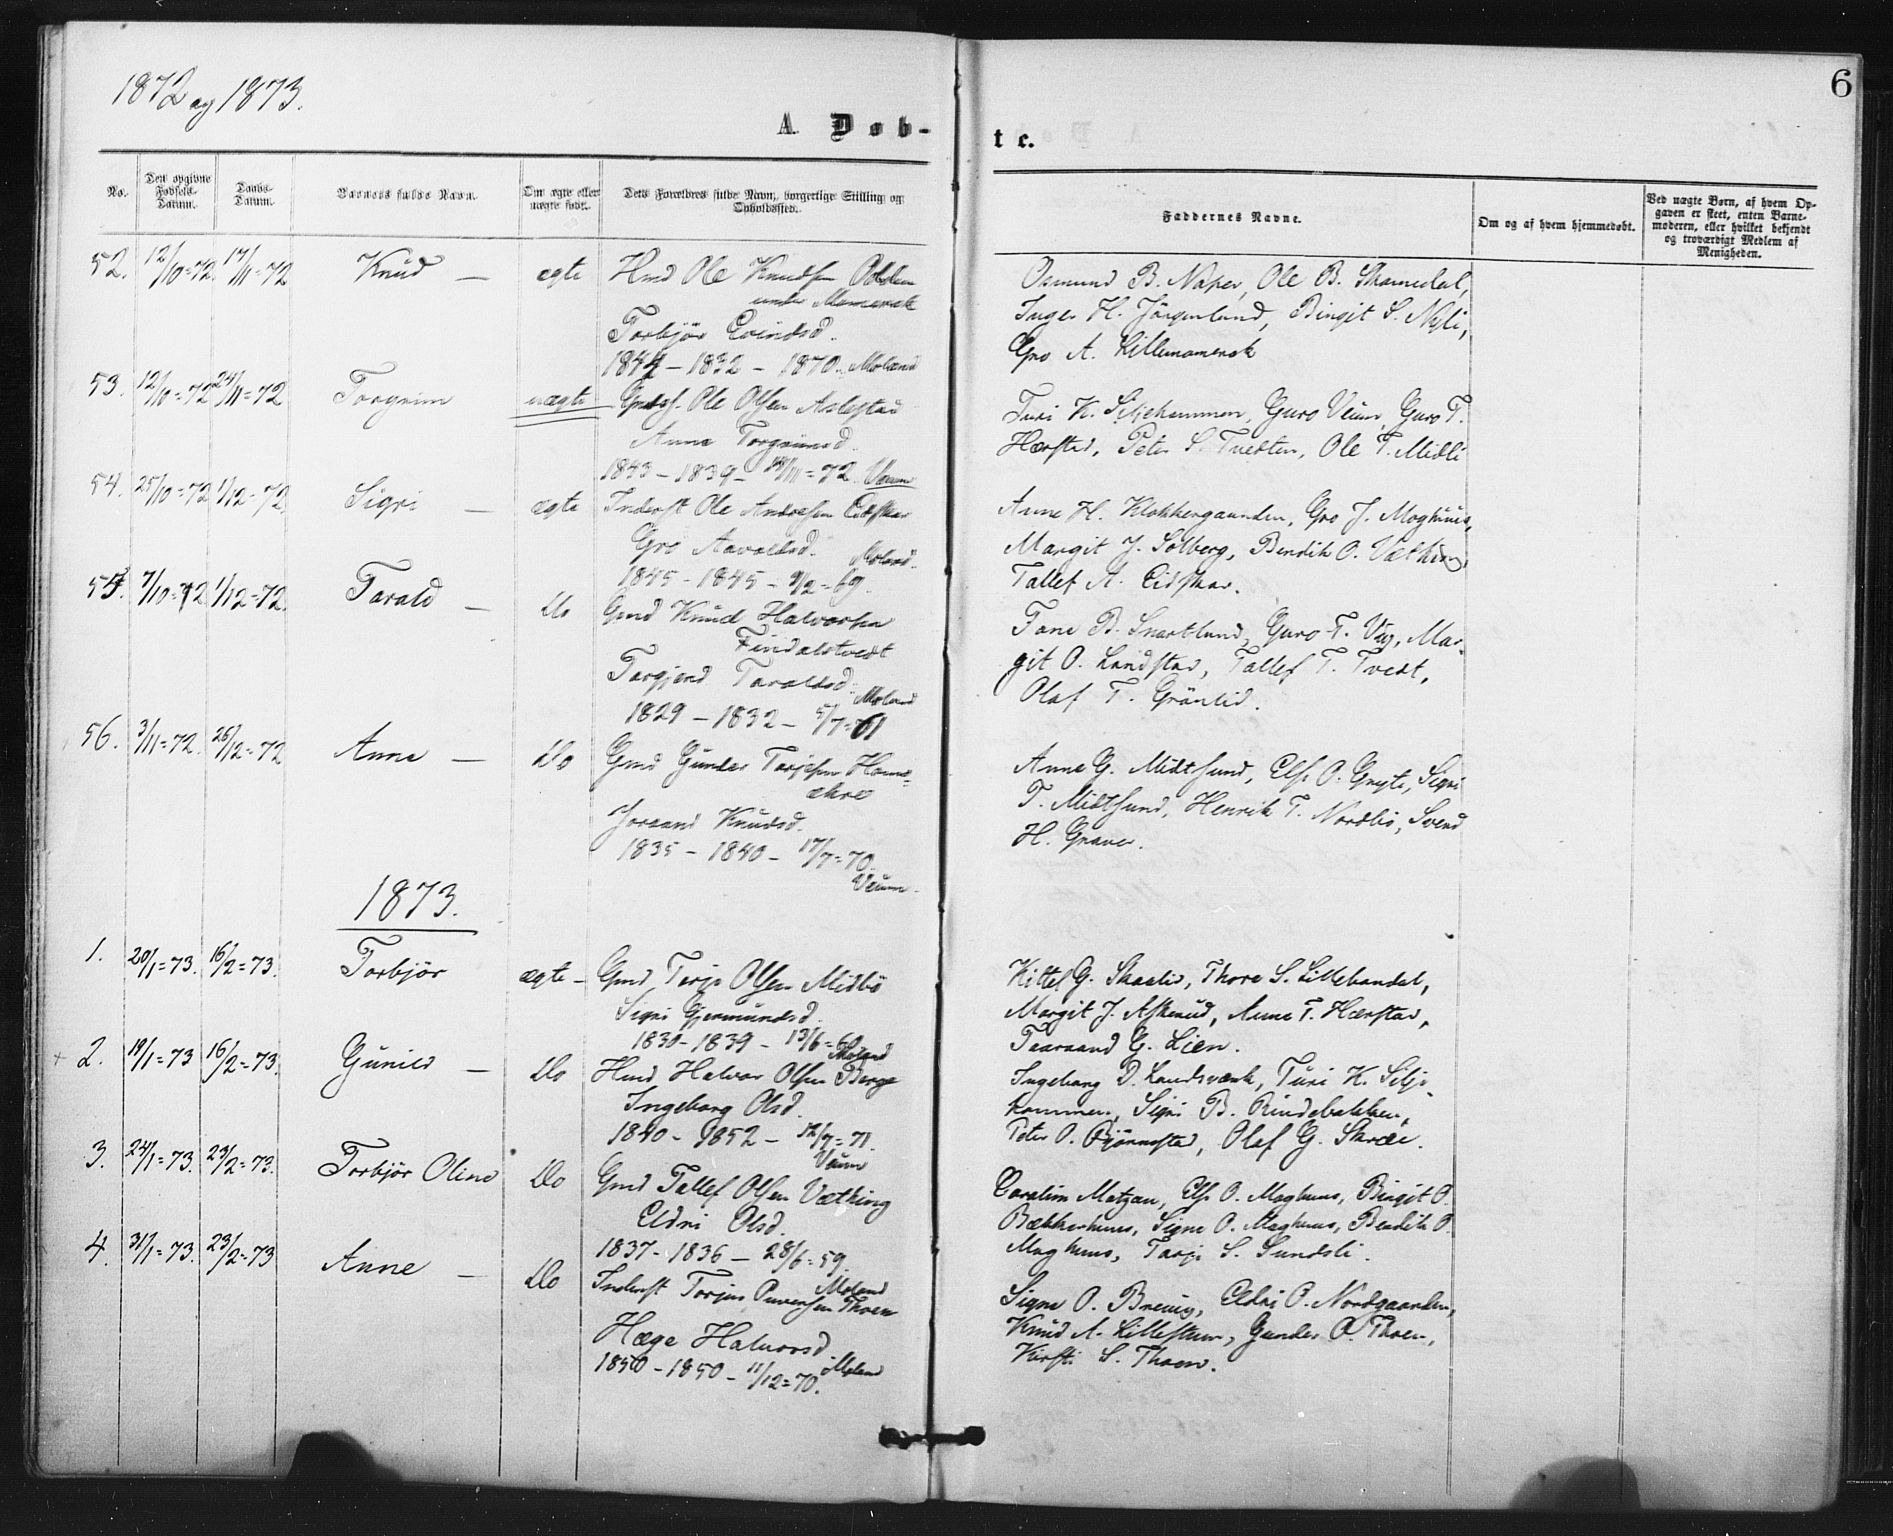 SAKO, Fyresdal kirkebøker, F/Fa/L0006: Parish register (official) no. I 6, 1872-1886, p. 6